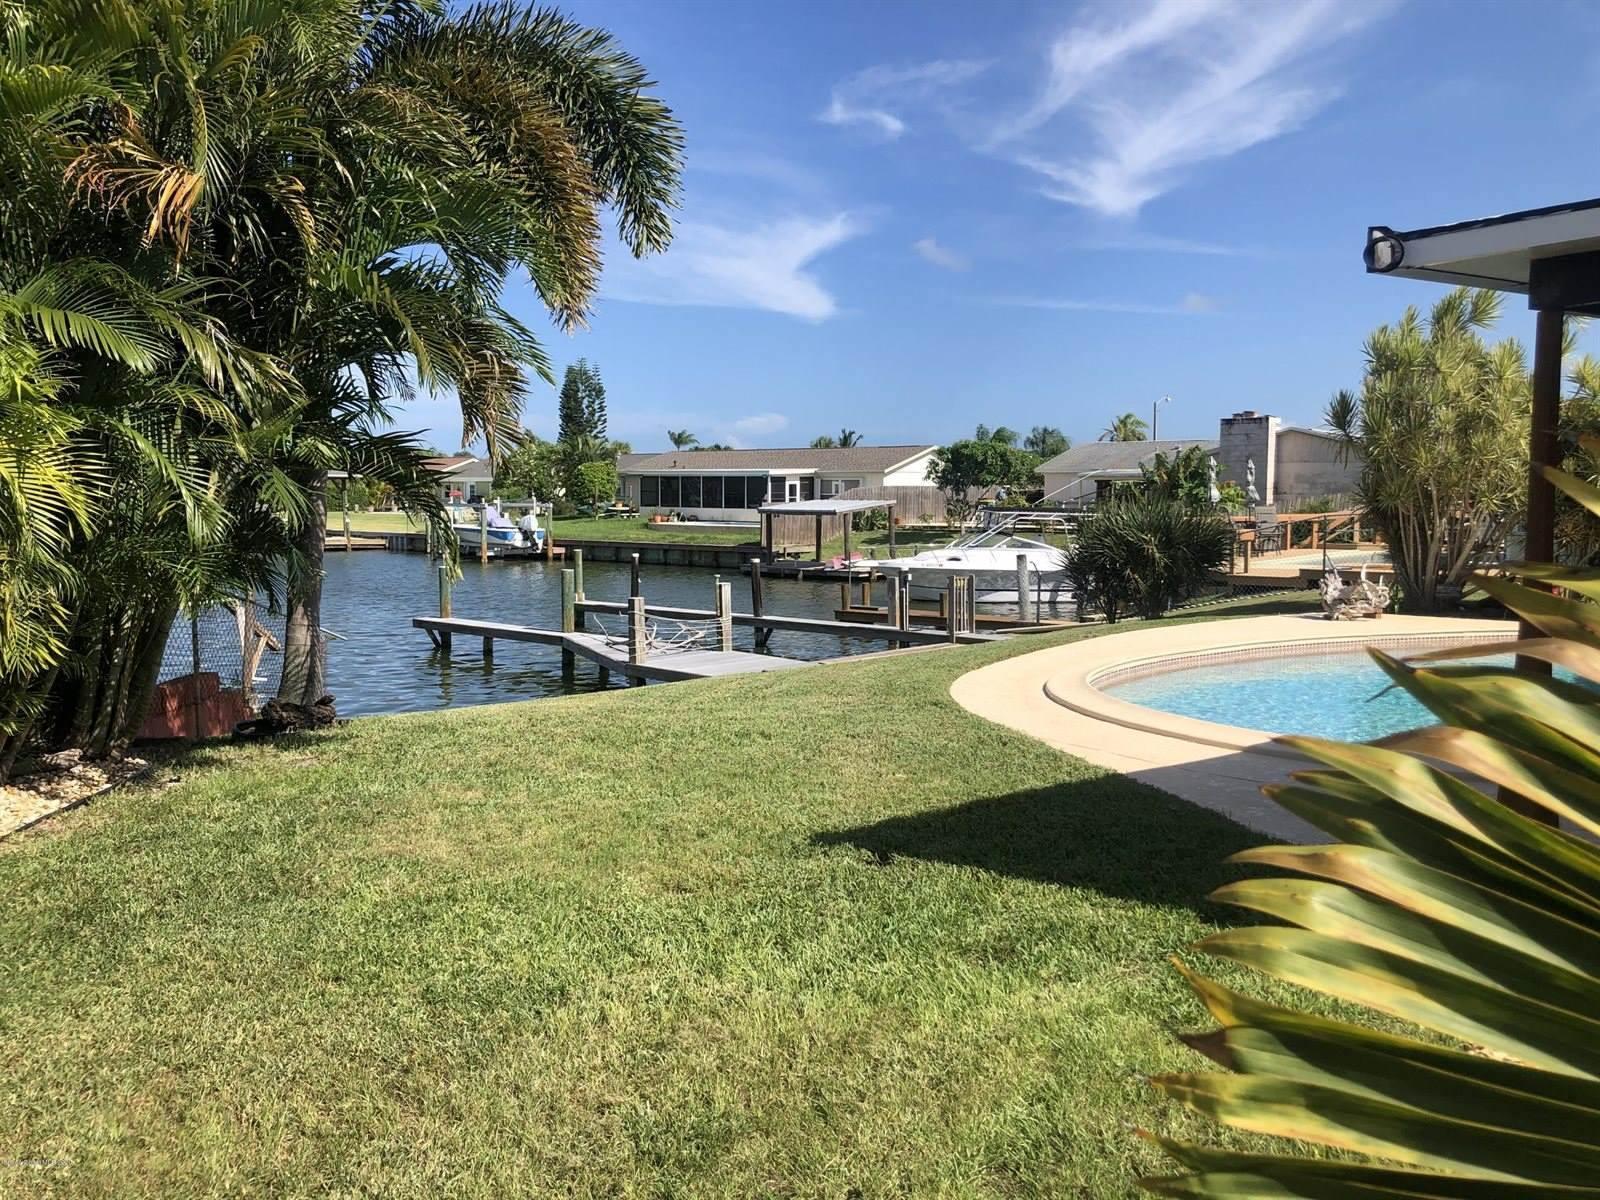 950 New Hampton Way, Merritt Island, FL 32953